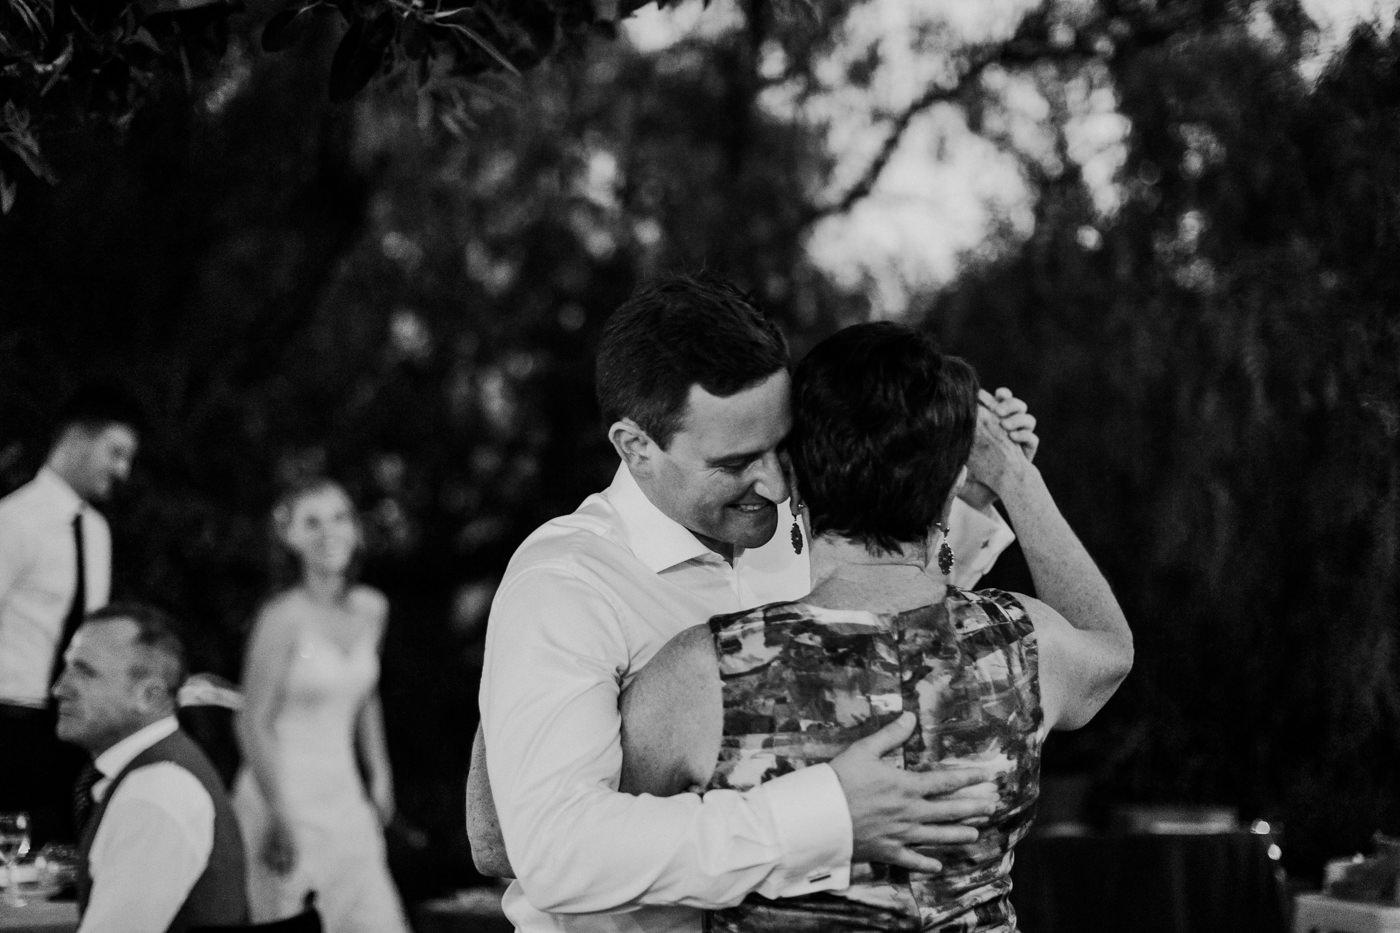 Anthony & Eliet - Wagga Wagga Wedding - Country NSW - Samantha Heather Photography-172.jpg